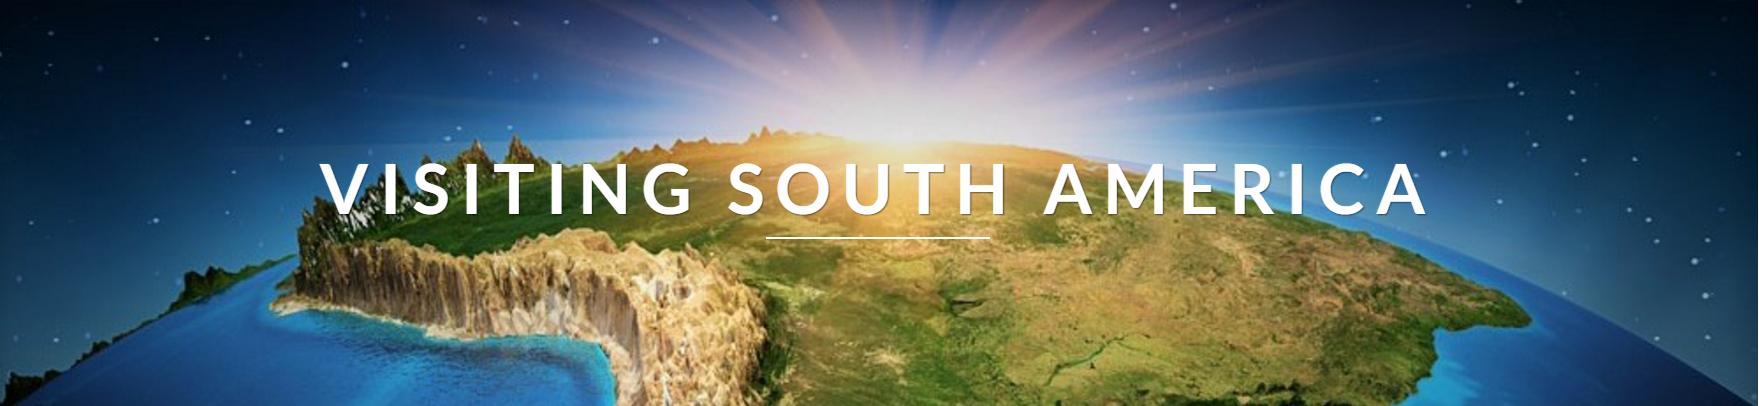 Visiting South America